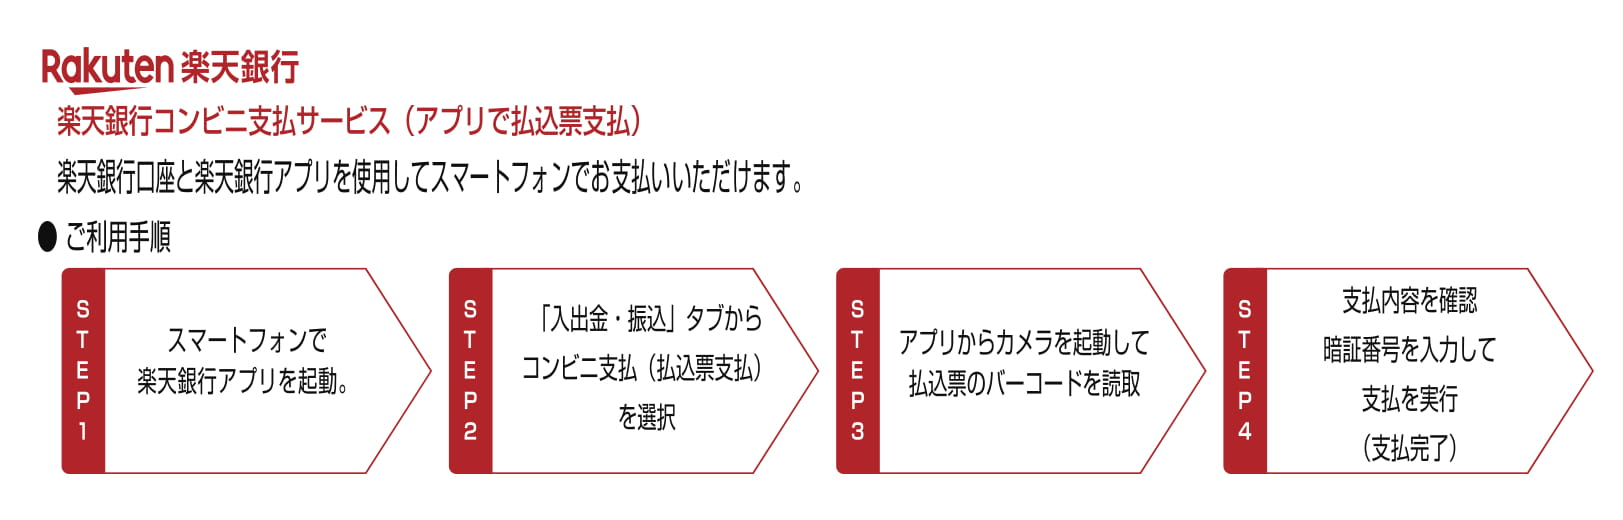 楽天 銀行 銀行 コード